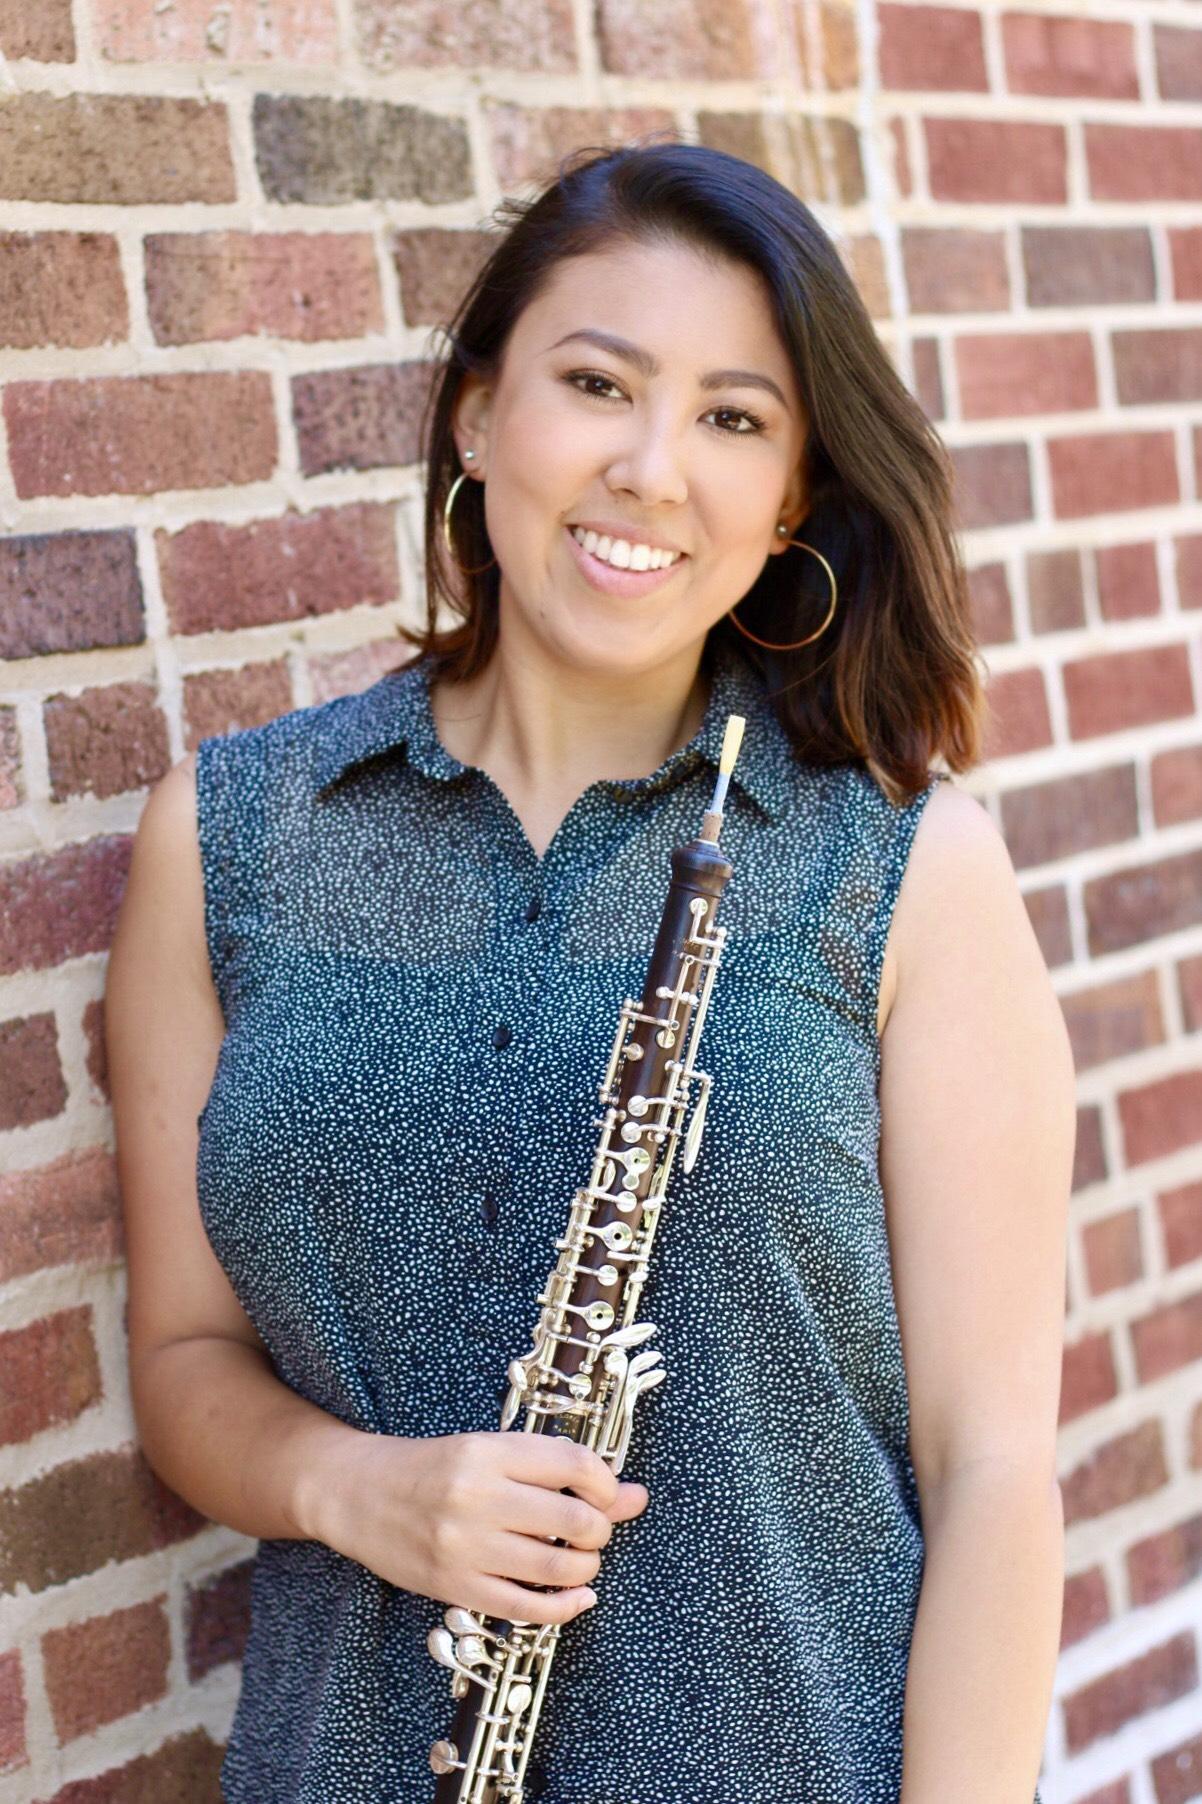 Second Oboe